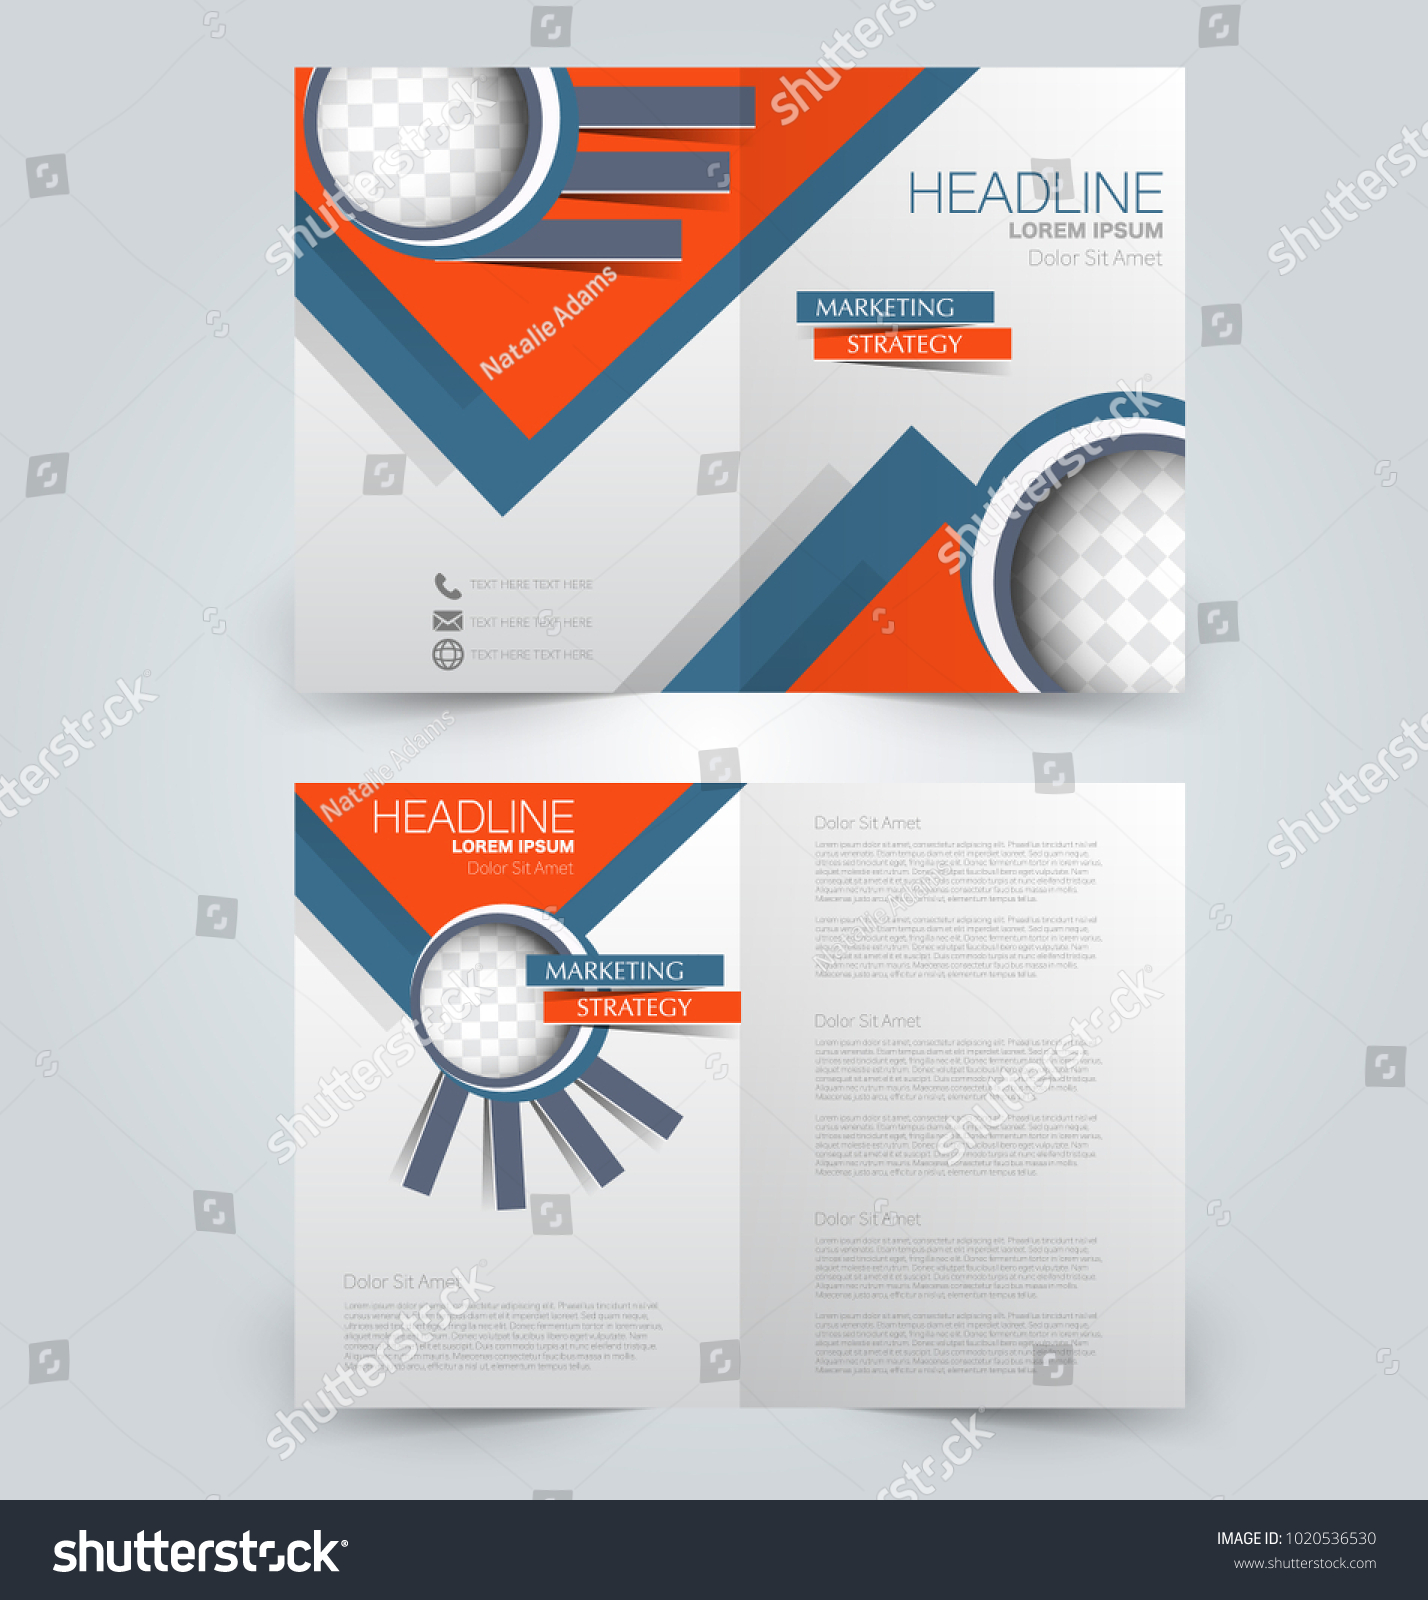 Fold Brochure Template Flyer Background Design Stock Vector (2018 ...